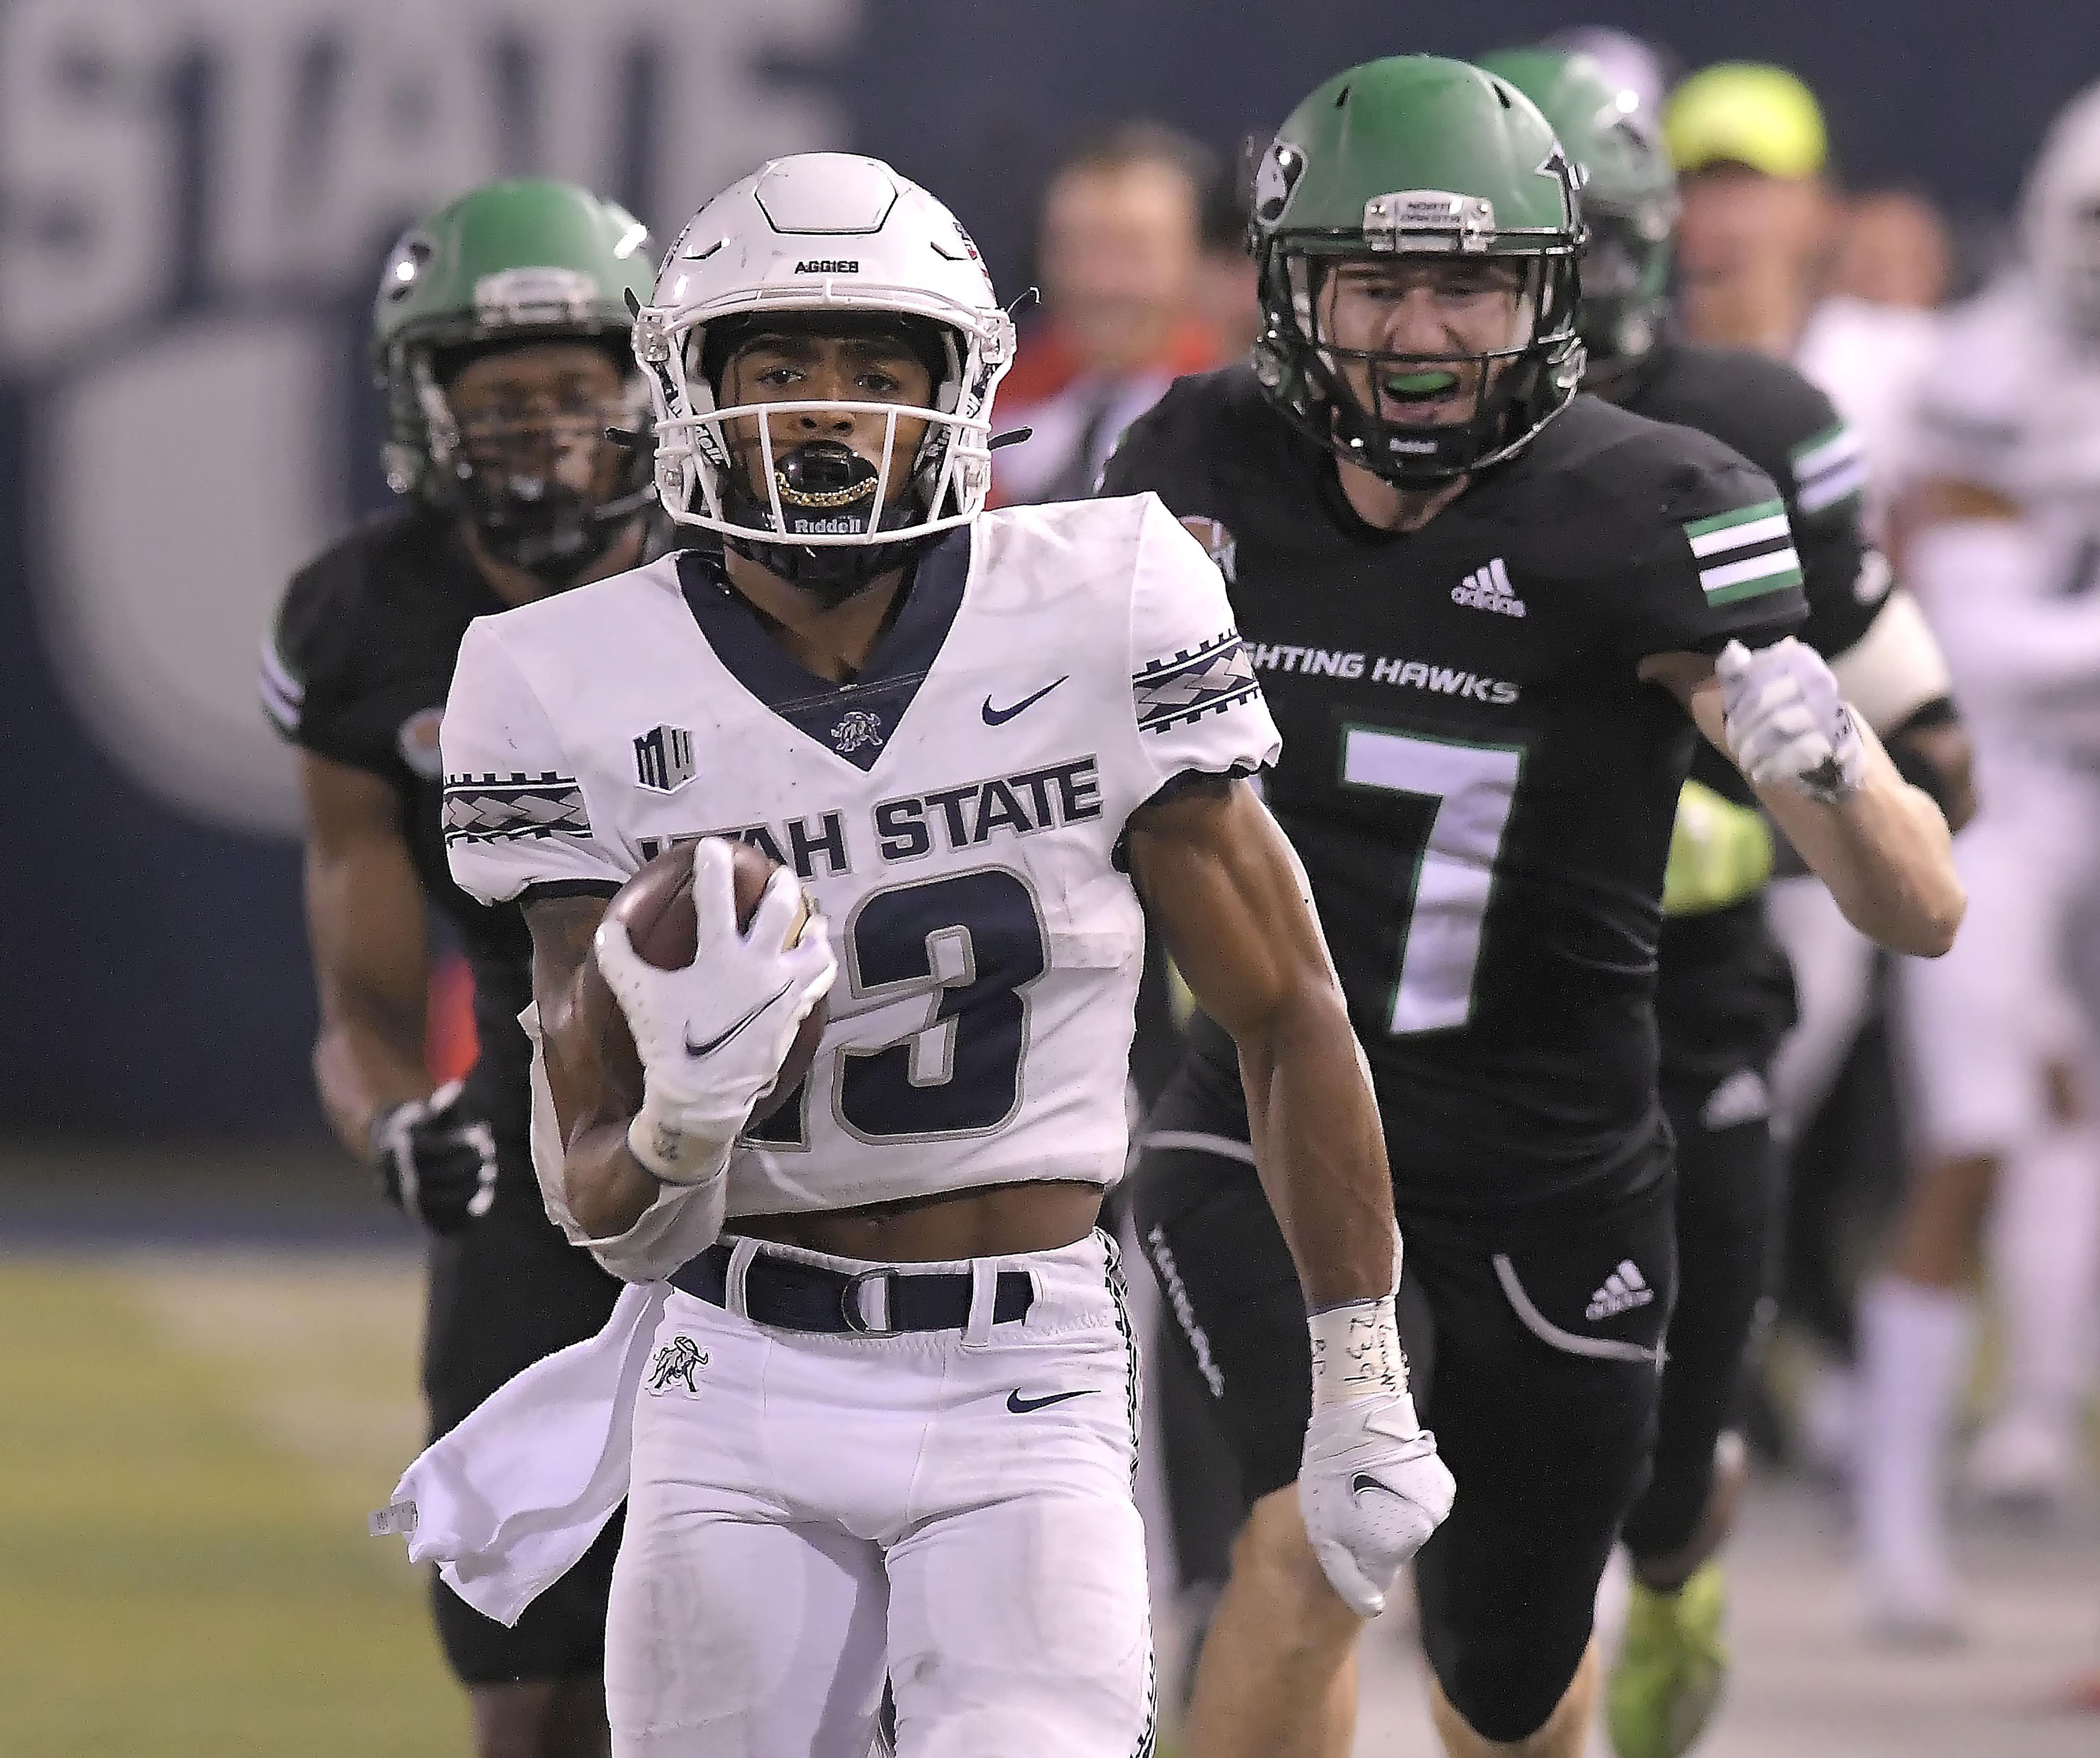 Utah State wide receiver Deven Thompkins runs down the field for a 75-yard touchdown.